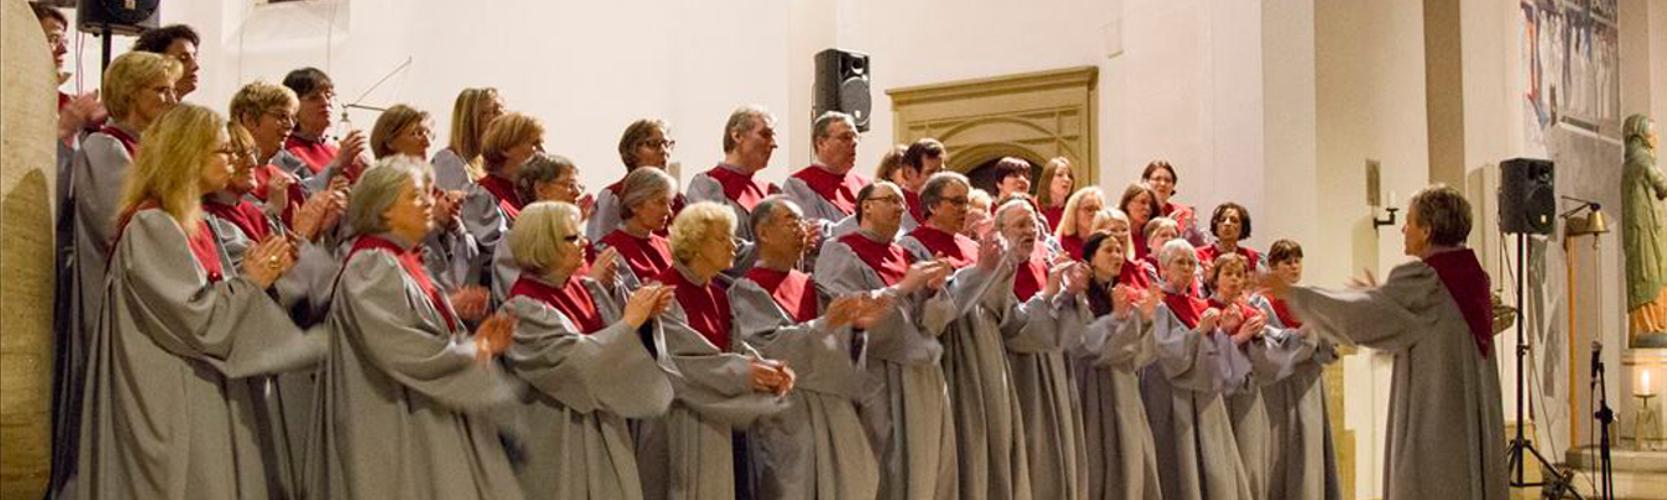 Spirit of Joy - Chor